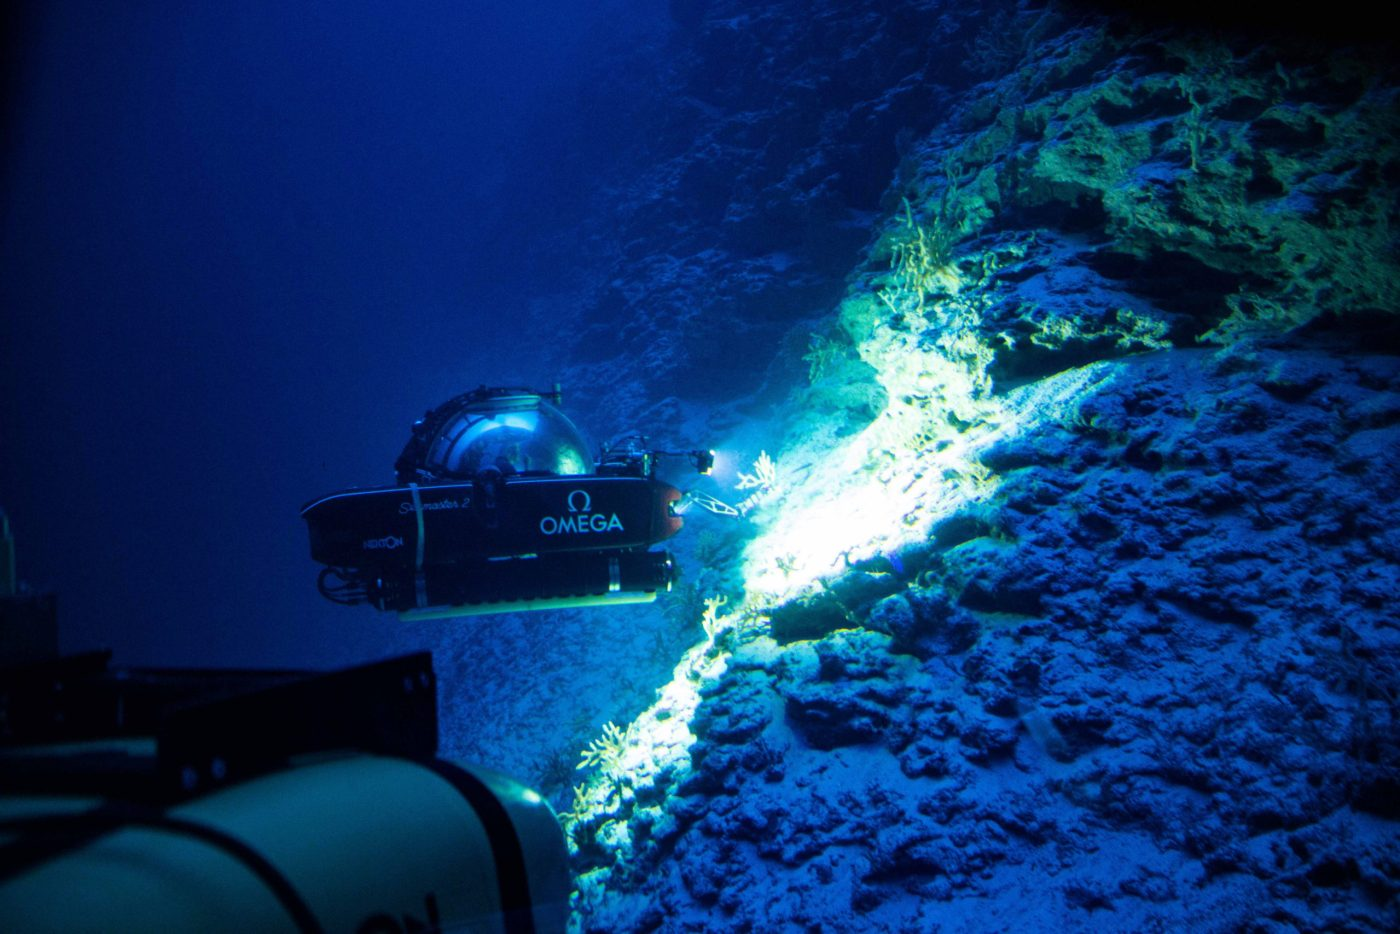 Seamaster exploring the deep